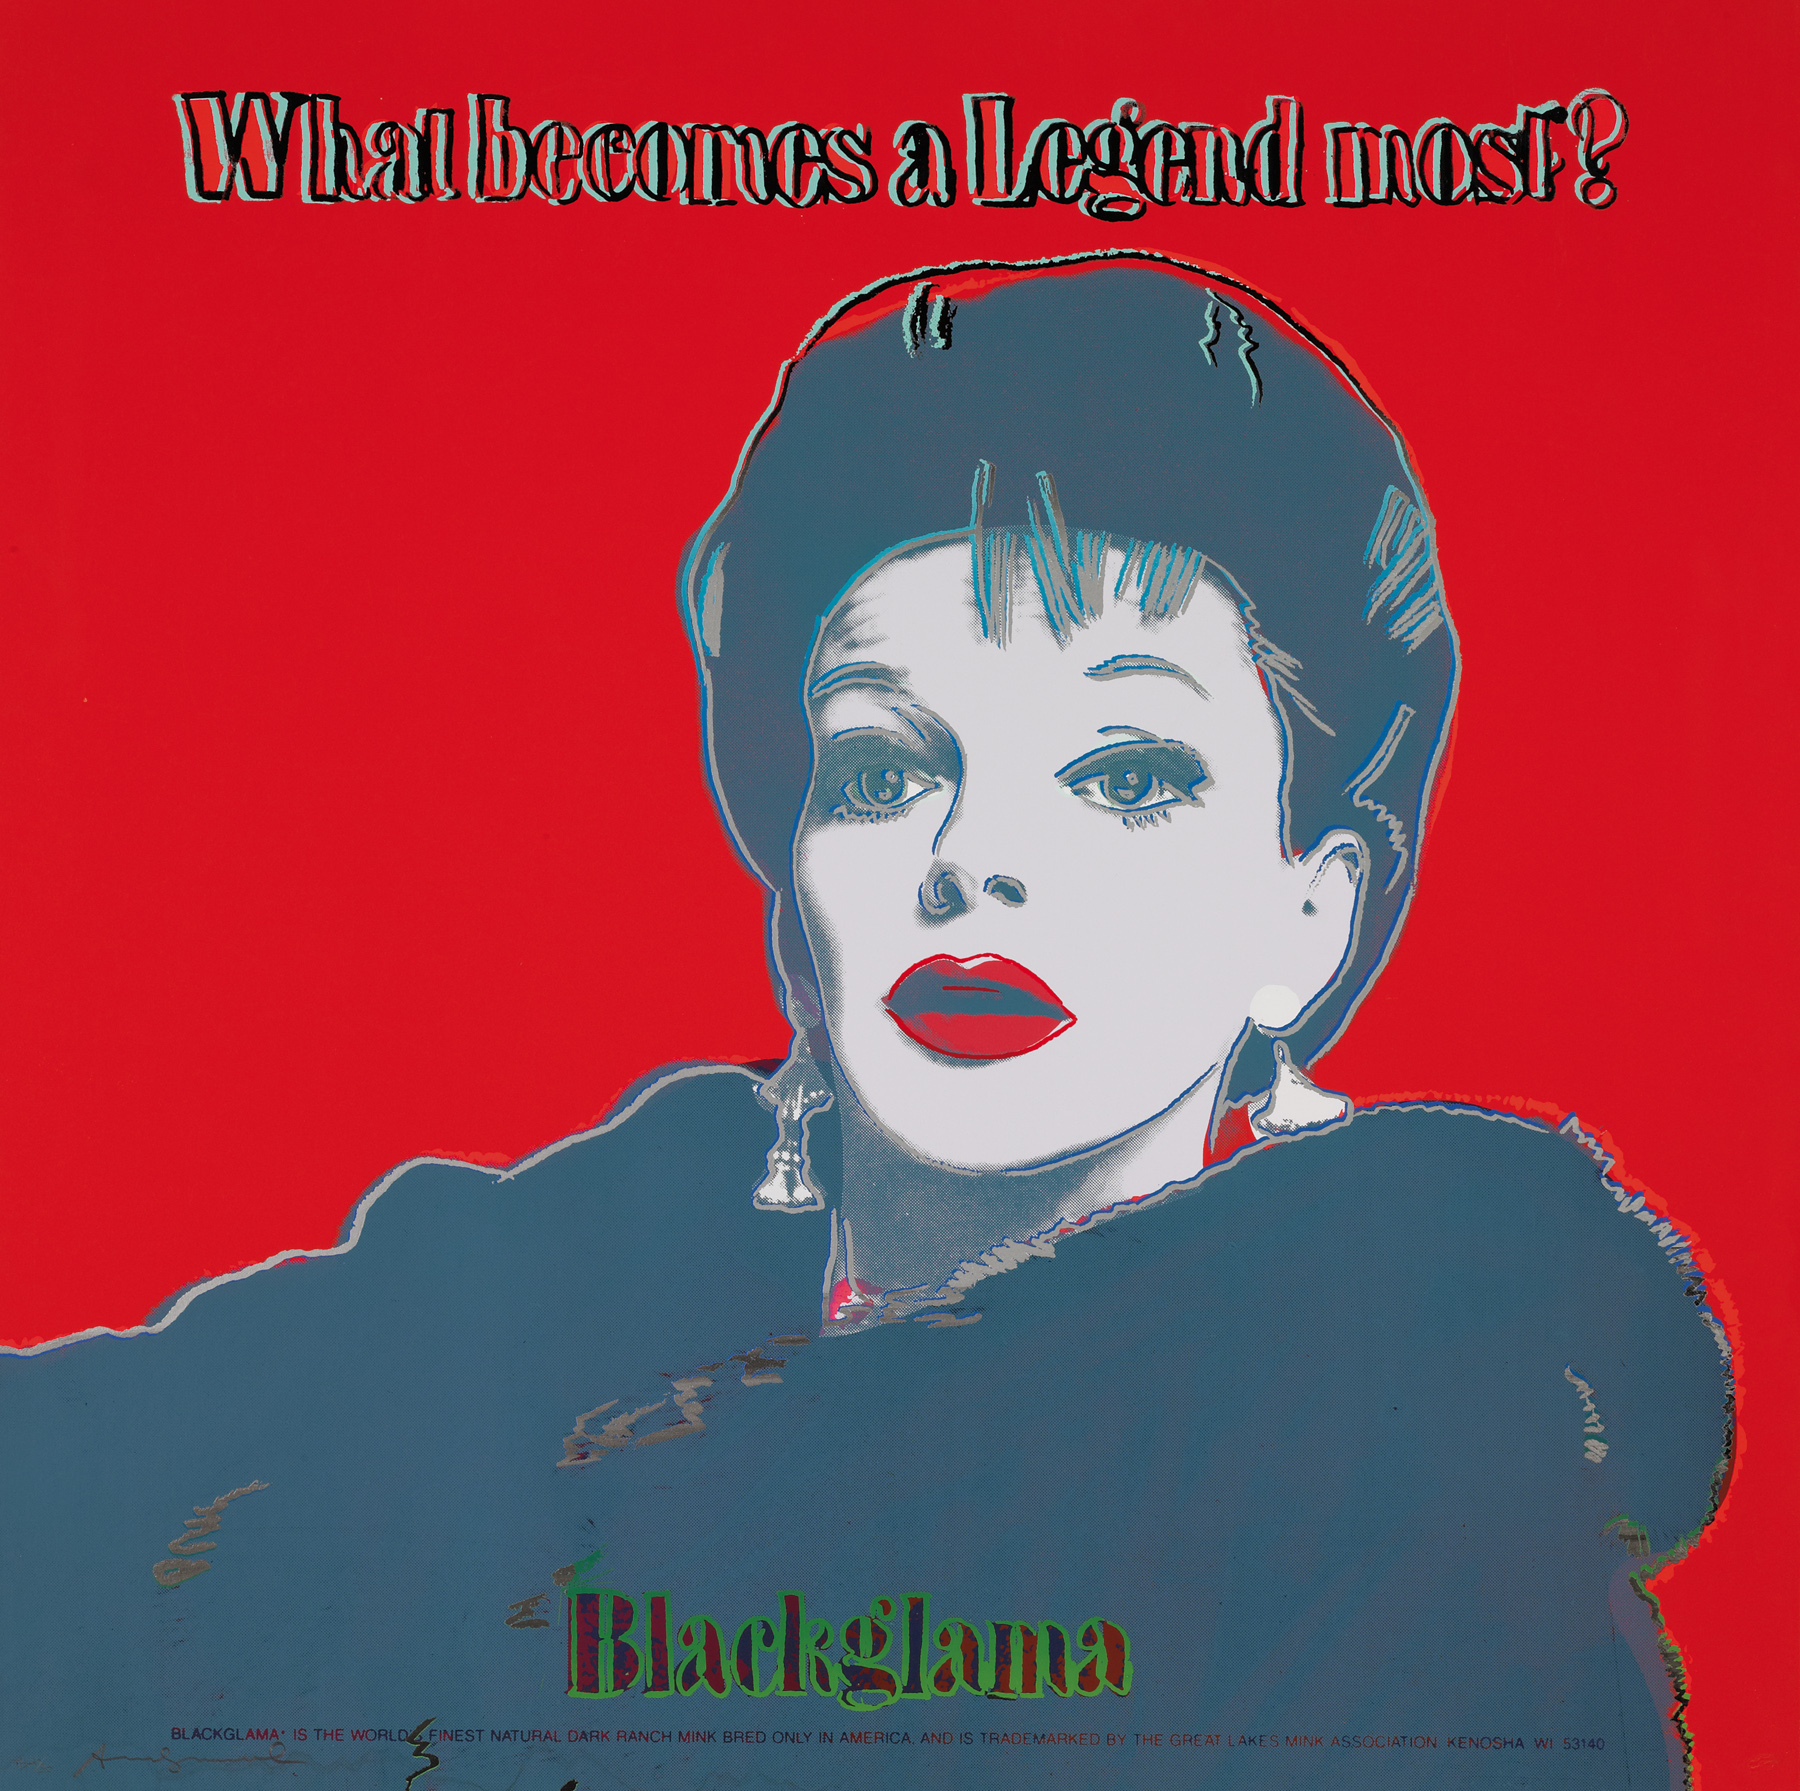 Blackglama, 1985 (#351, Ads) unique trial-proof hand-signed screenprint